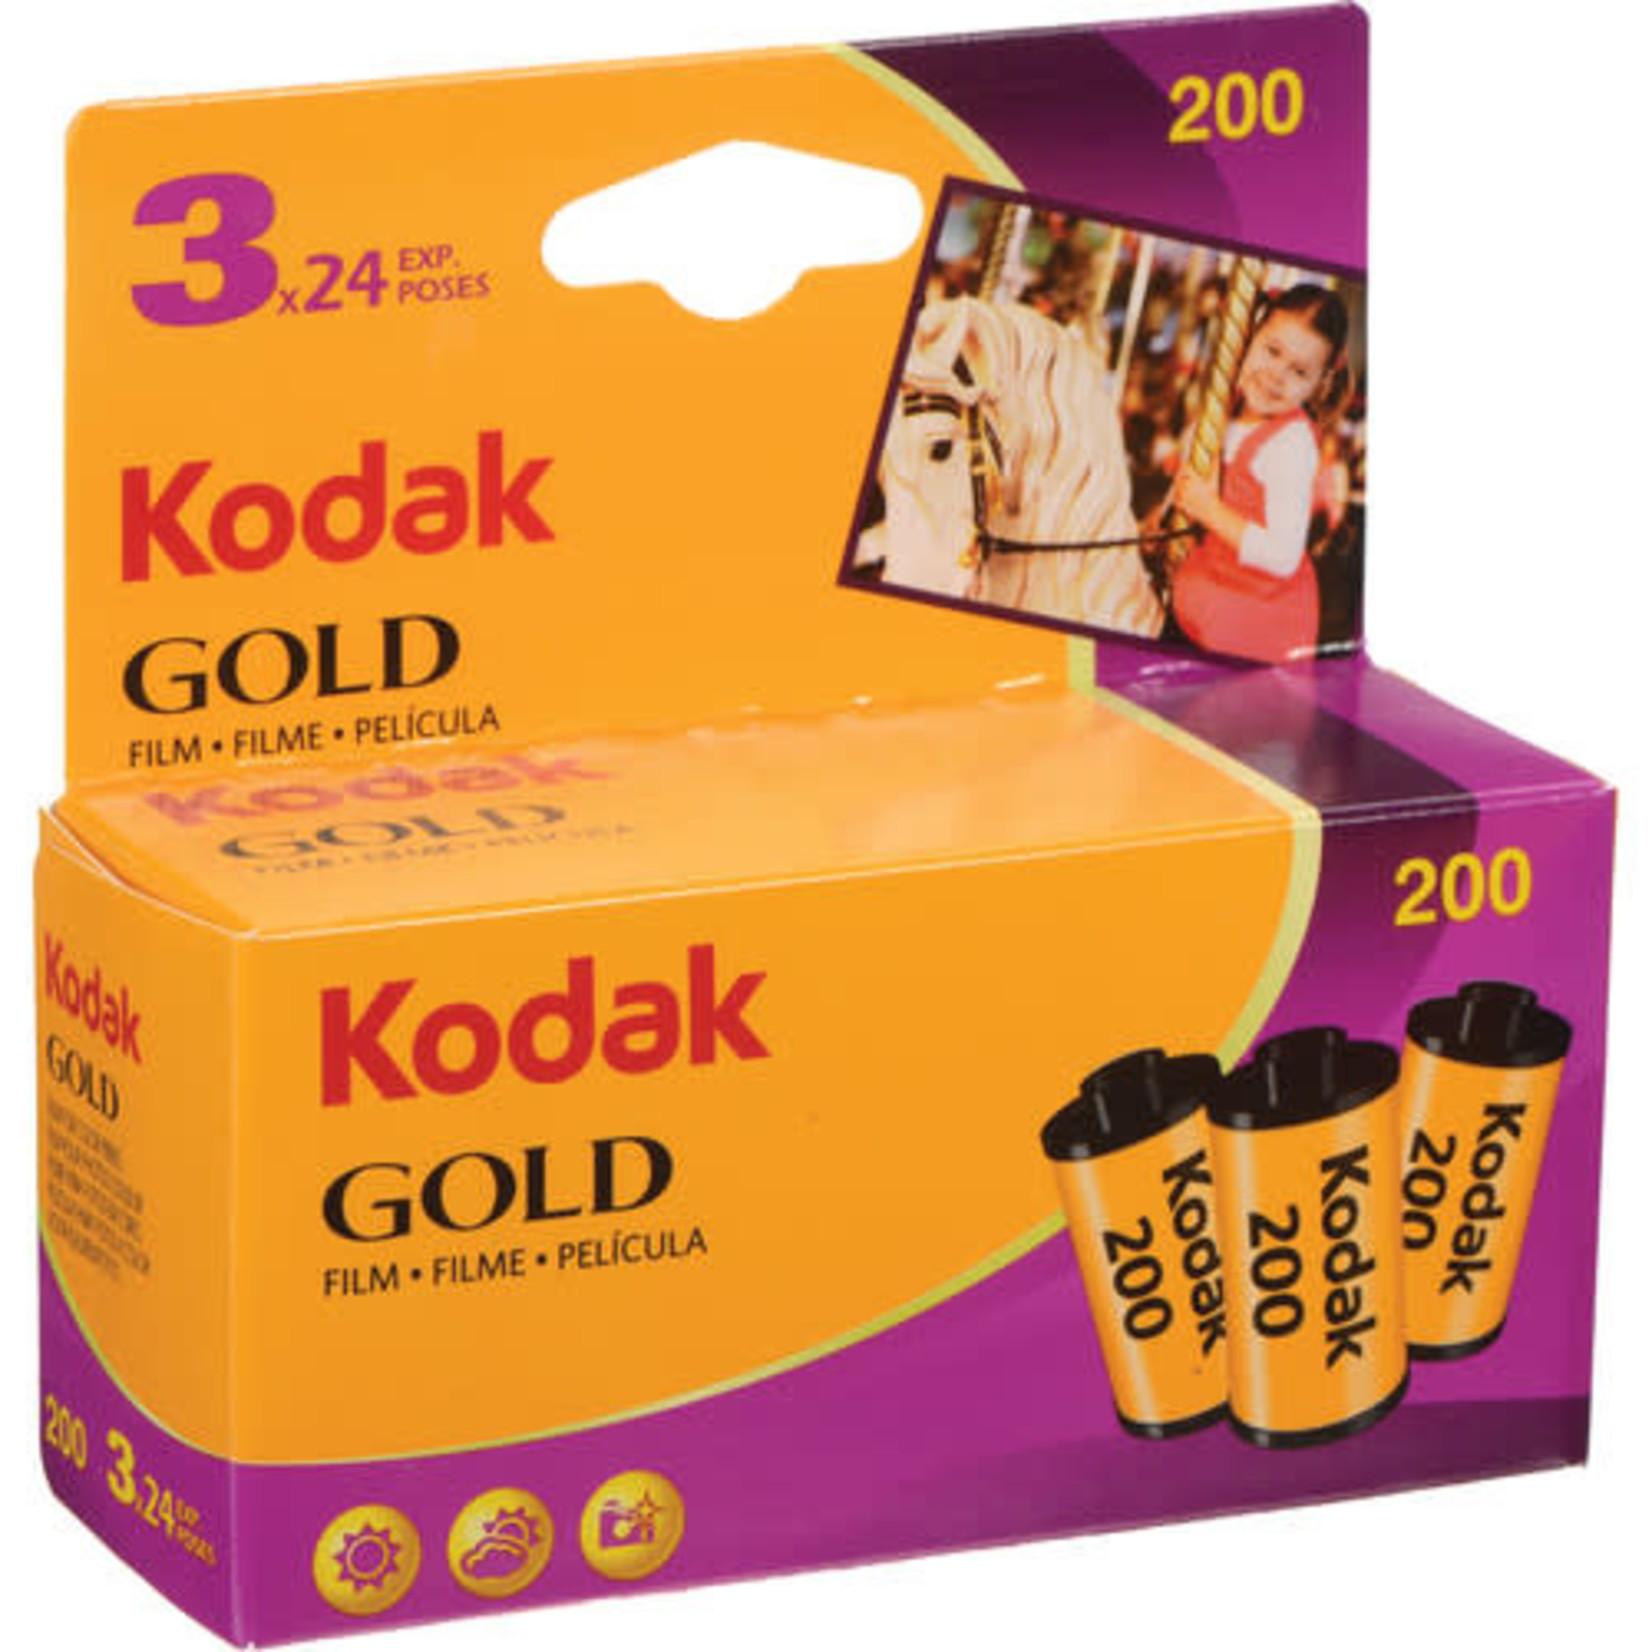 Kodak Kodak GOLD 200 Color Negative Film (35mm Roll Film, 24 Exposures, 3-Pack)